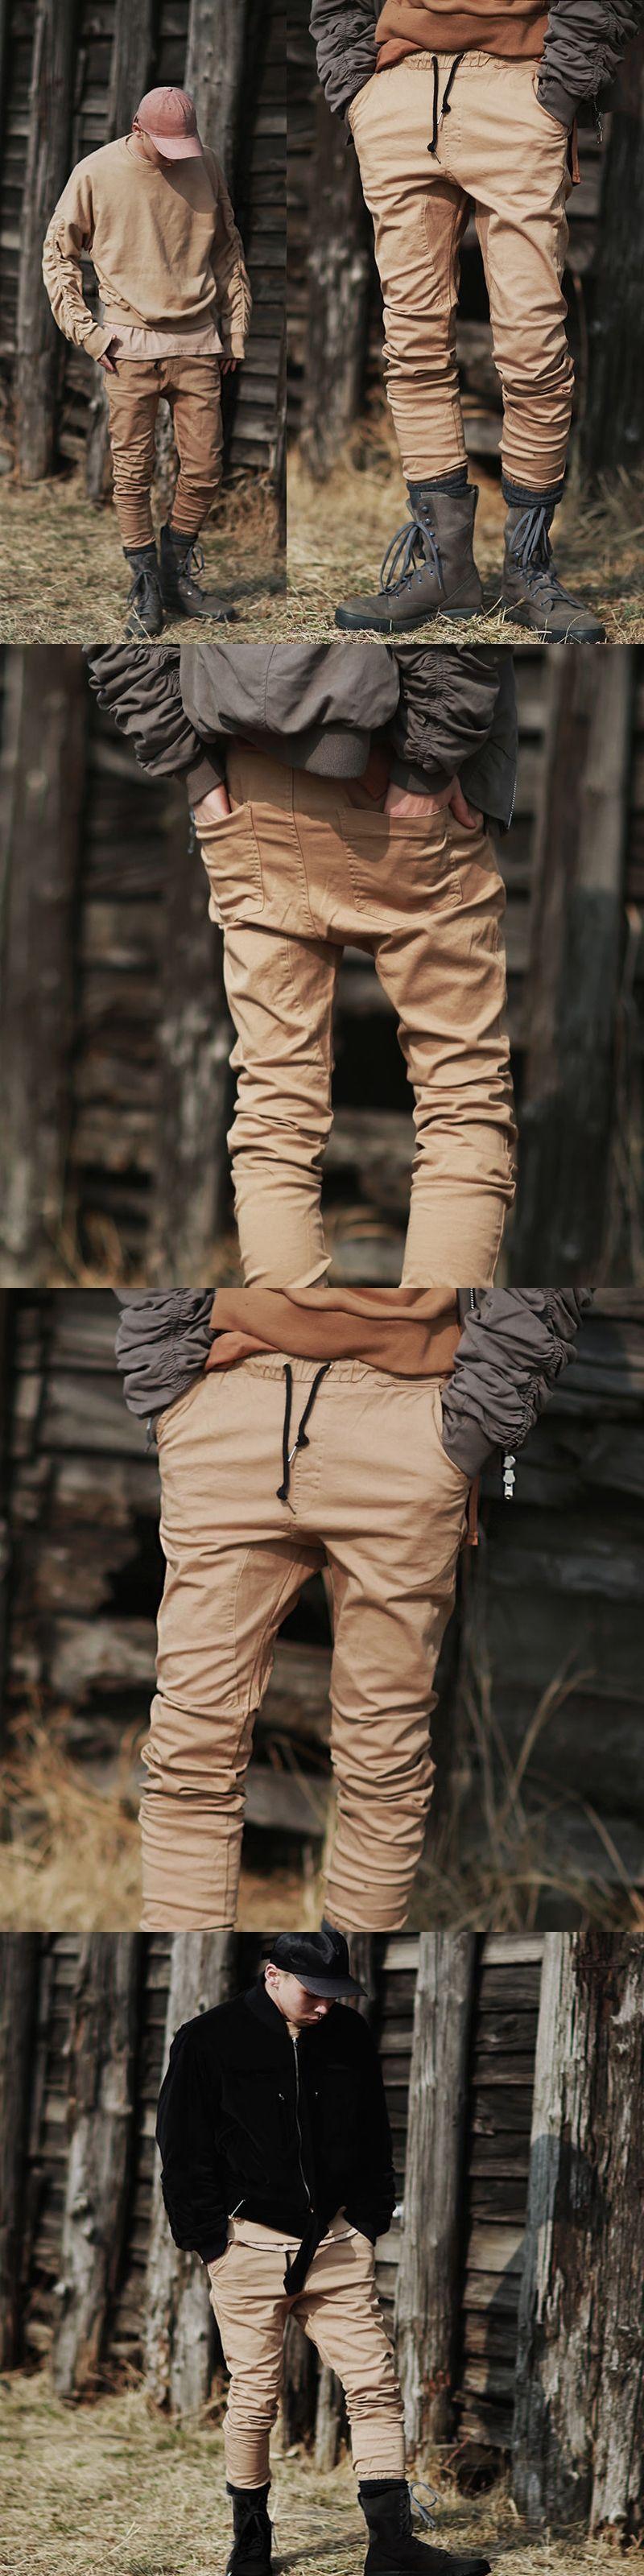 ba0aa66a7 Cool New Fashion Mens Joggers Cargo Men Pants Sweatpants Harem Pants Men  Pantalones Hombre Casual Pants